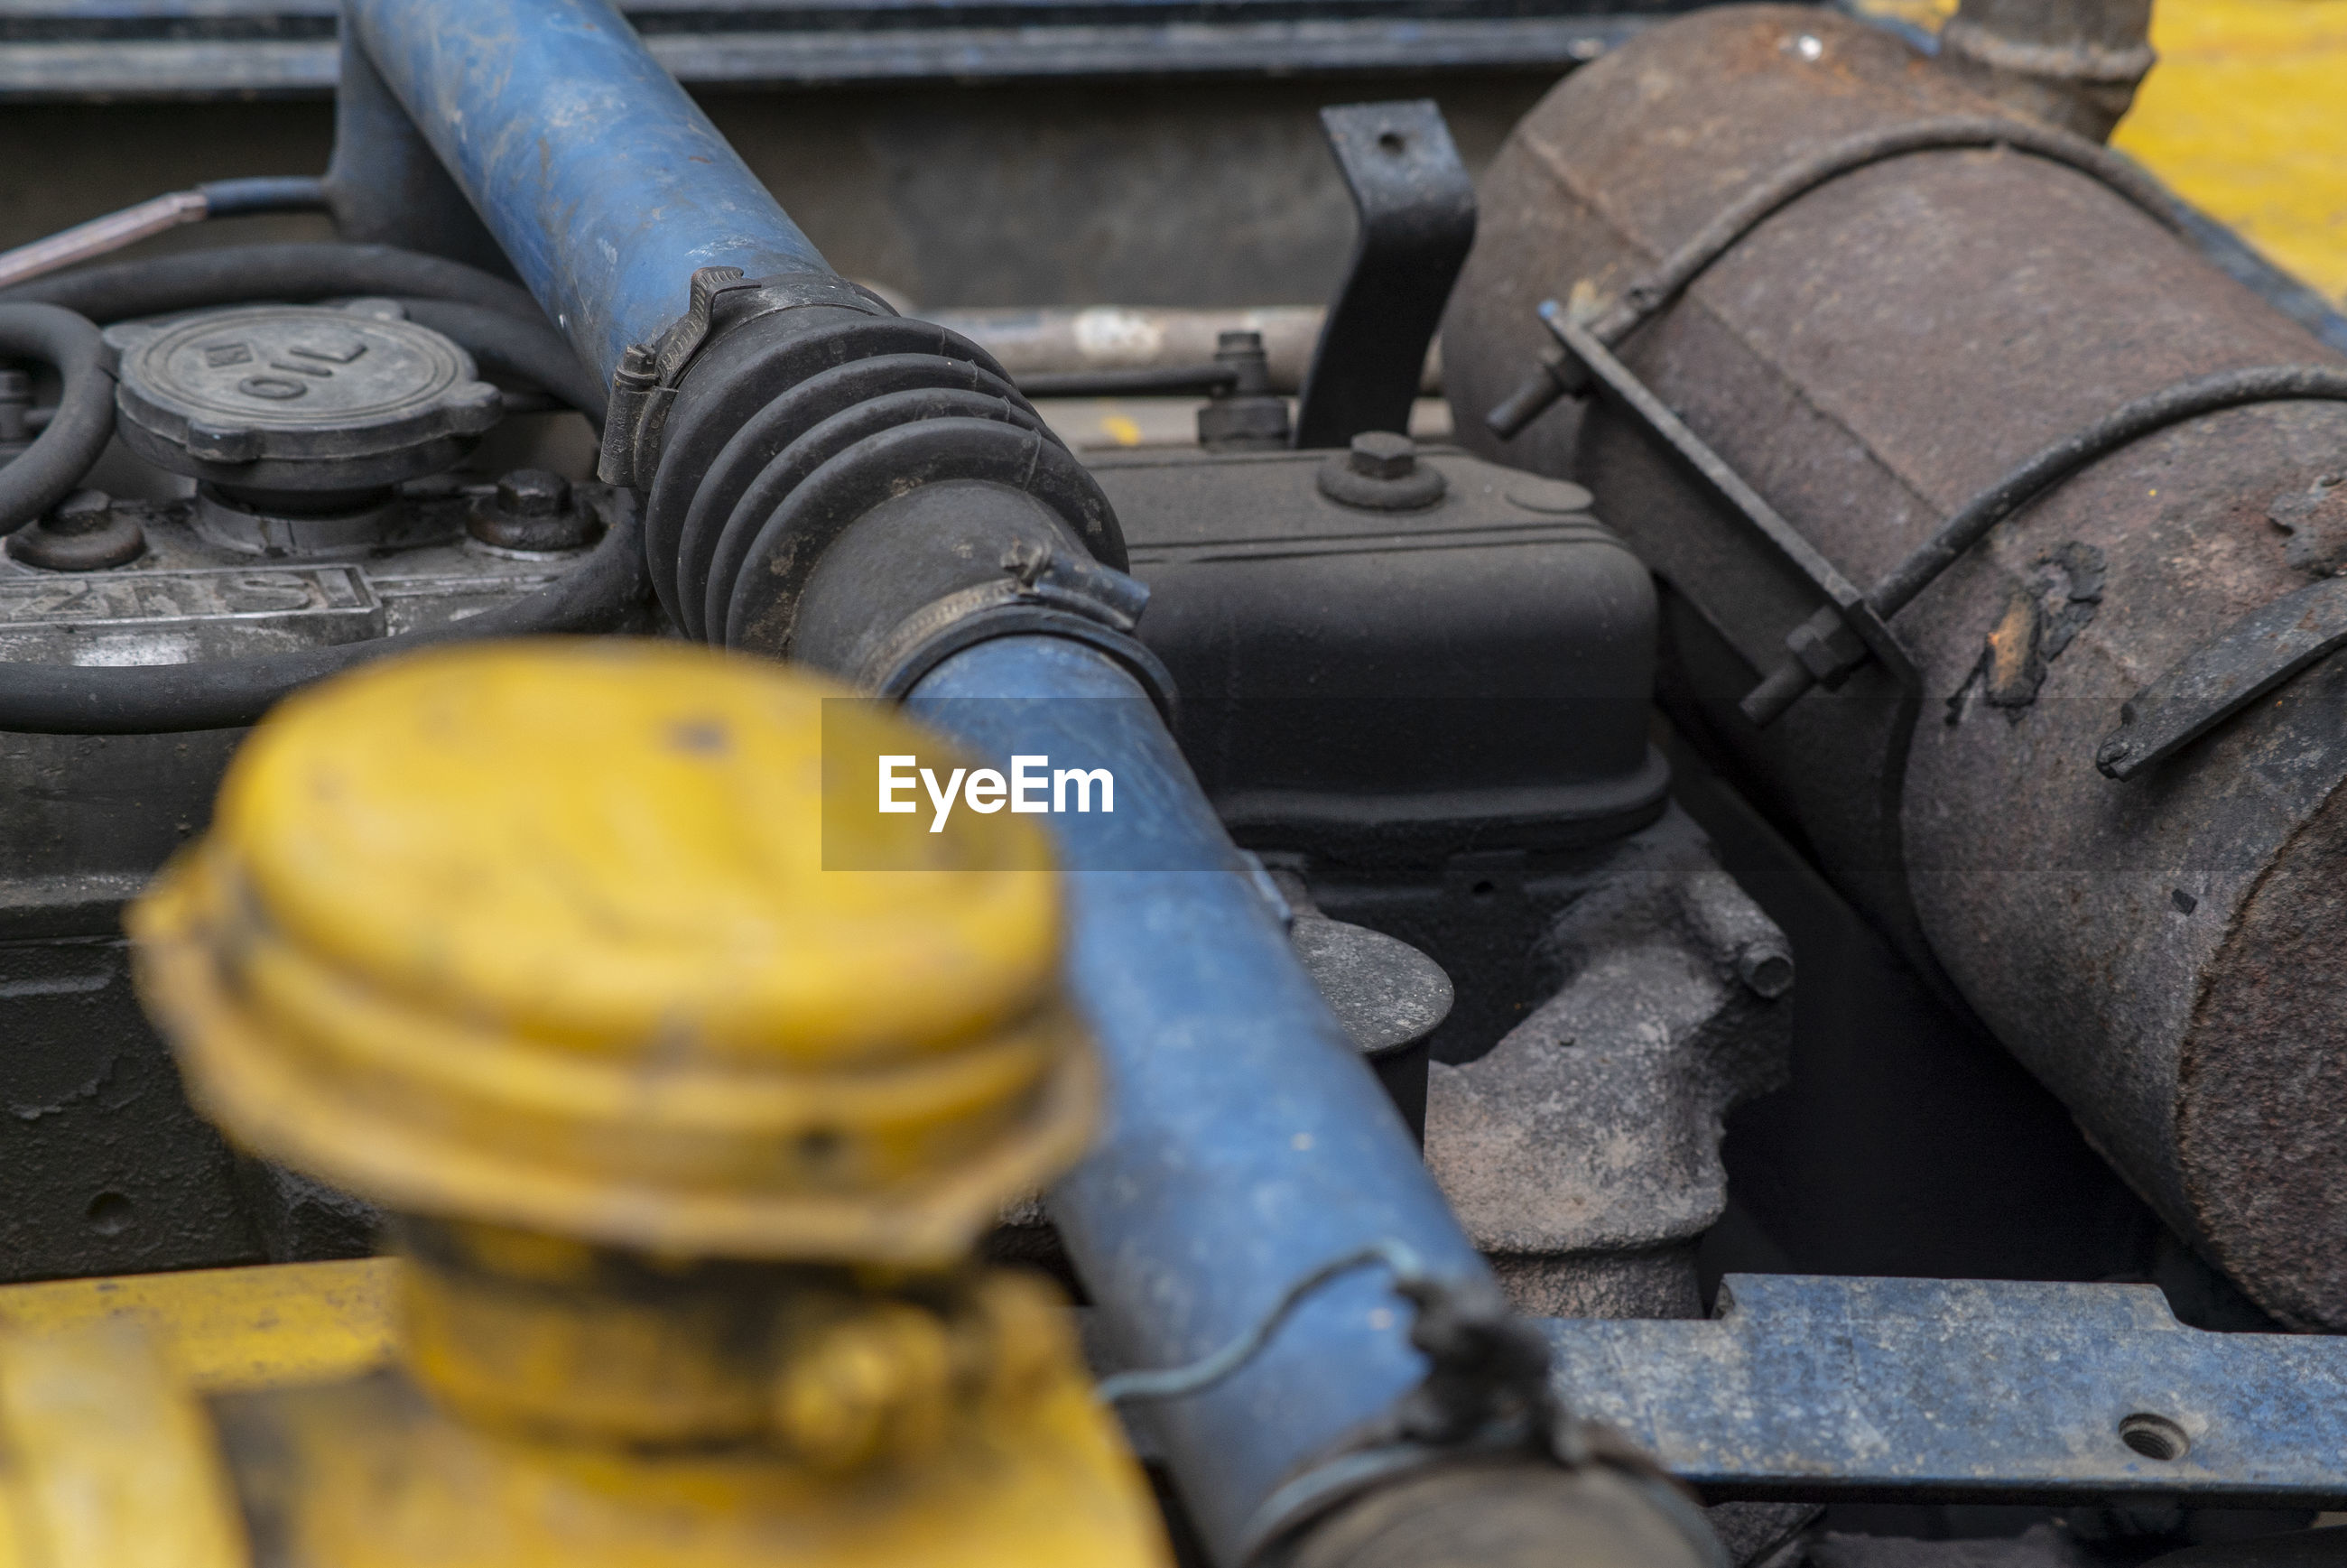 High angle view of vehicle engine